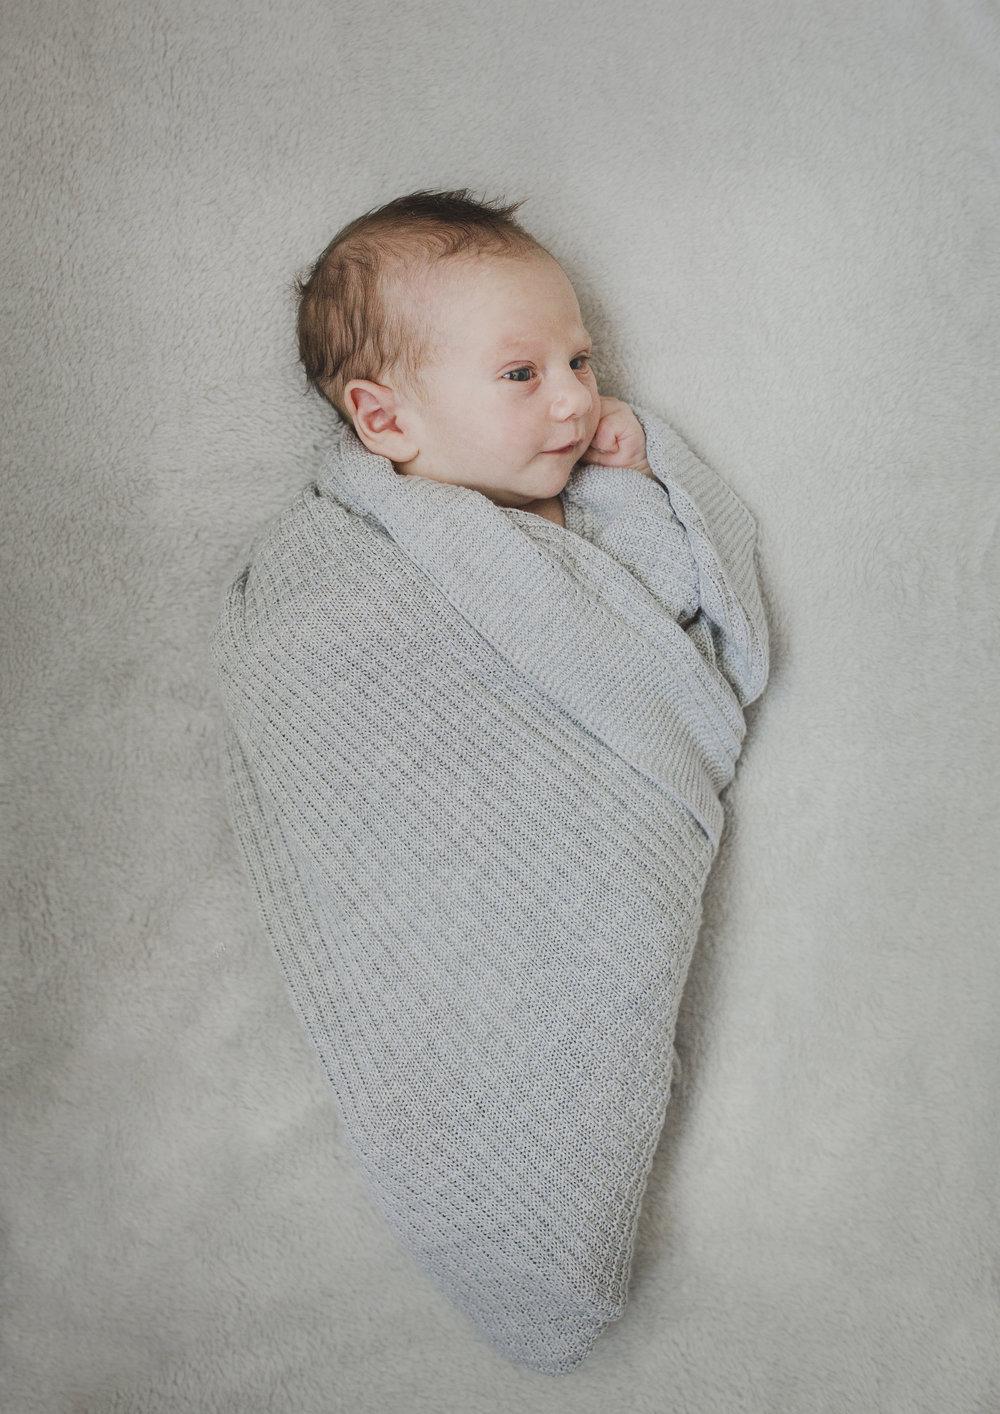 Bayside Newborn Lifestyle Photographer